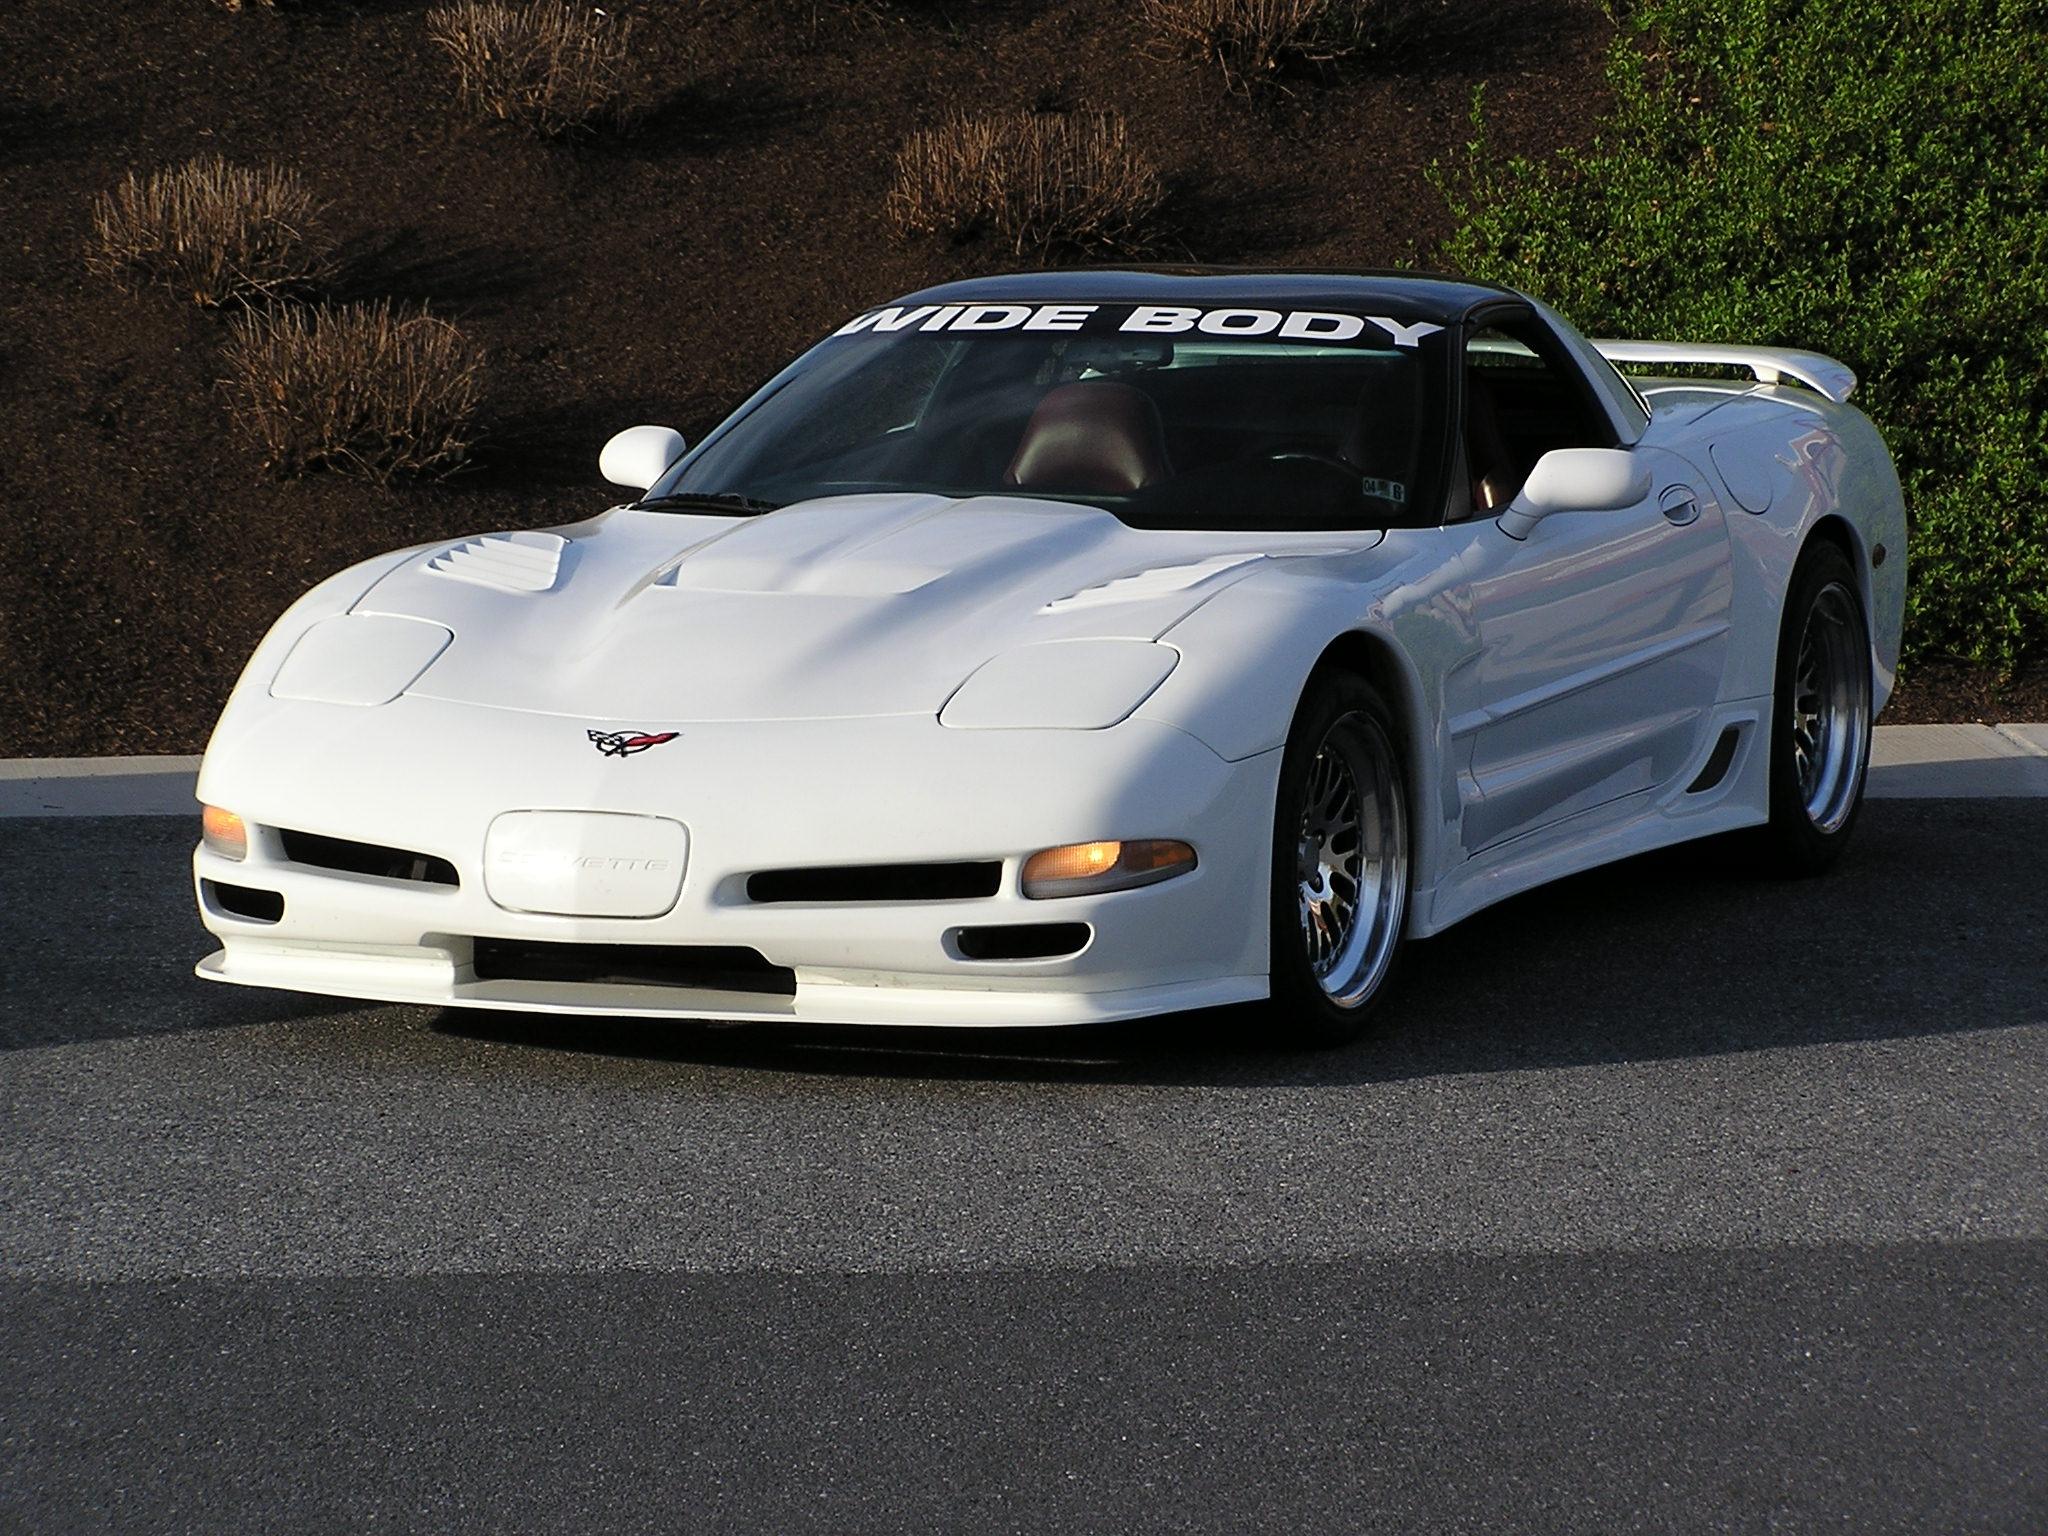 Corvette C5 Body Kit | ACP\'s White Wide Body...a head turner ...